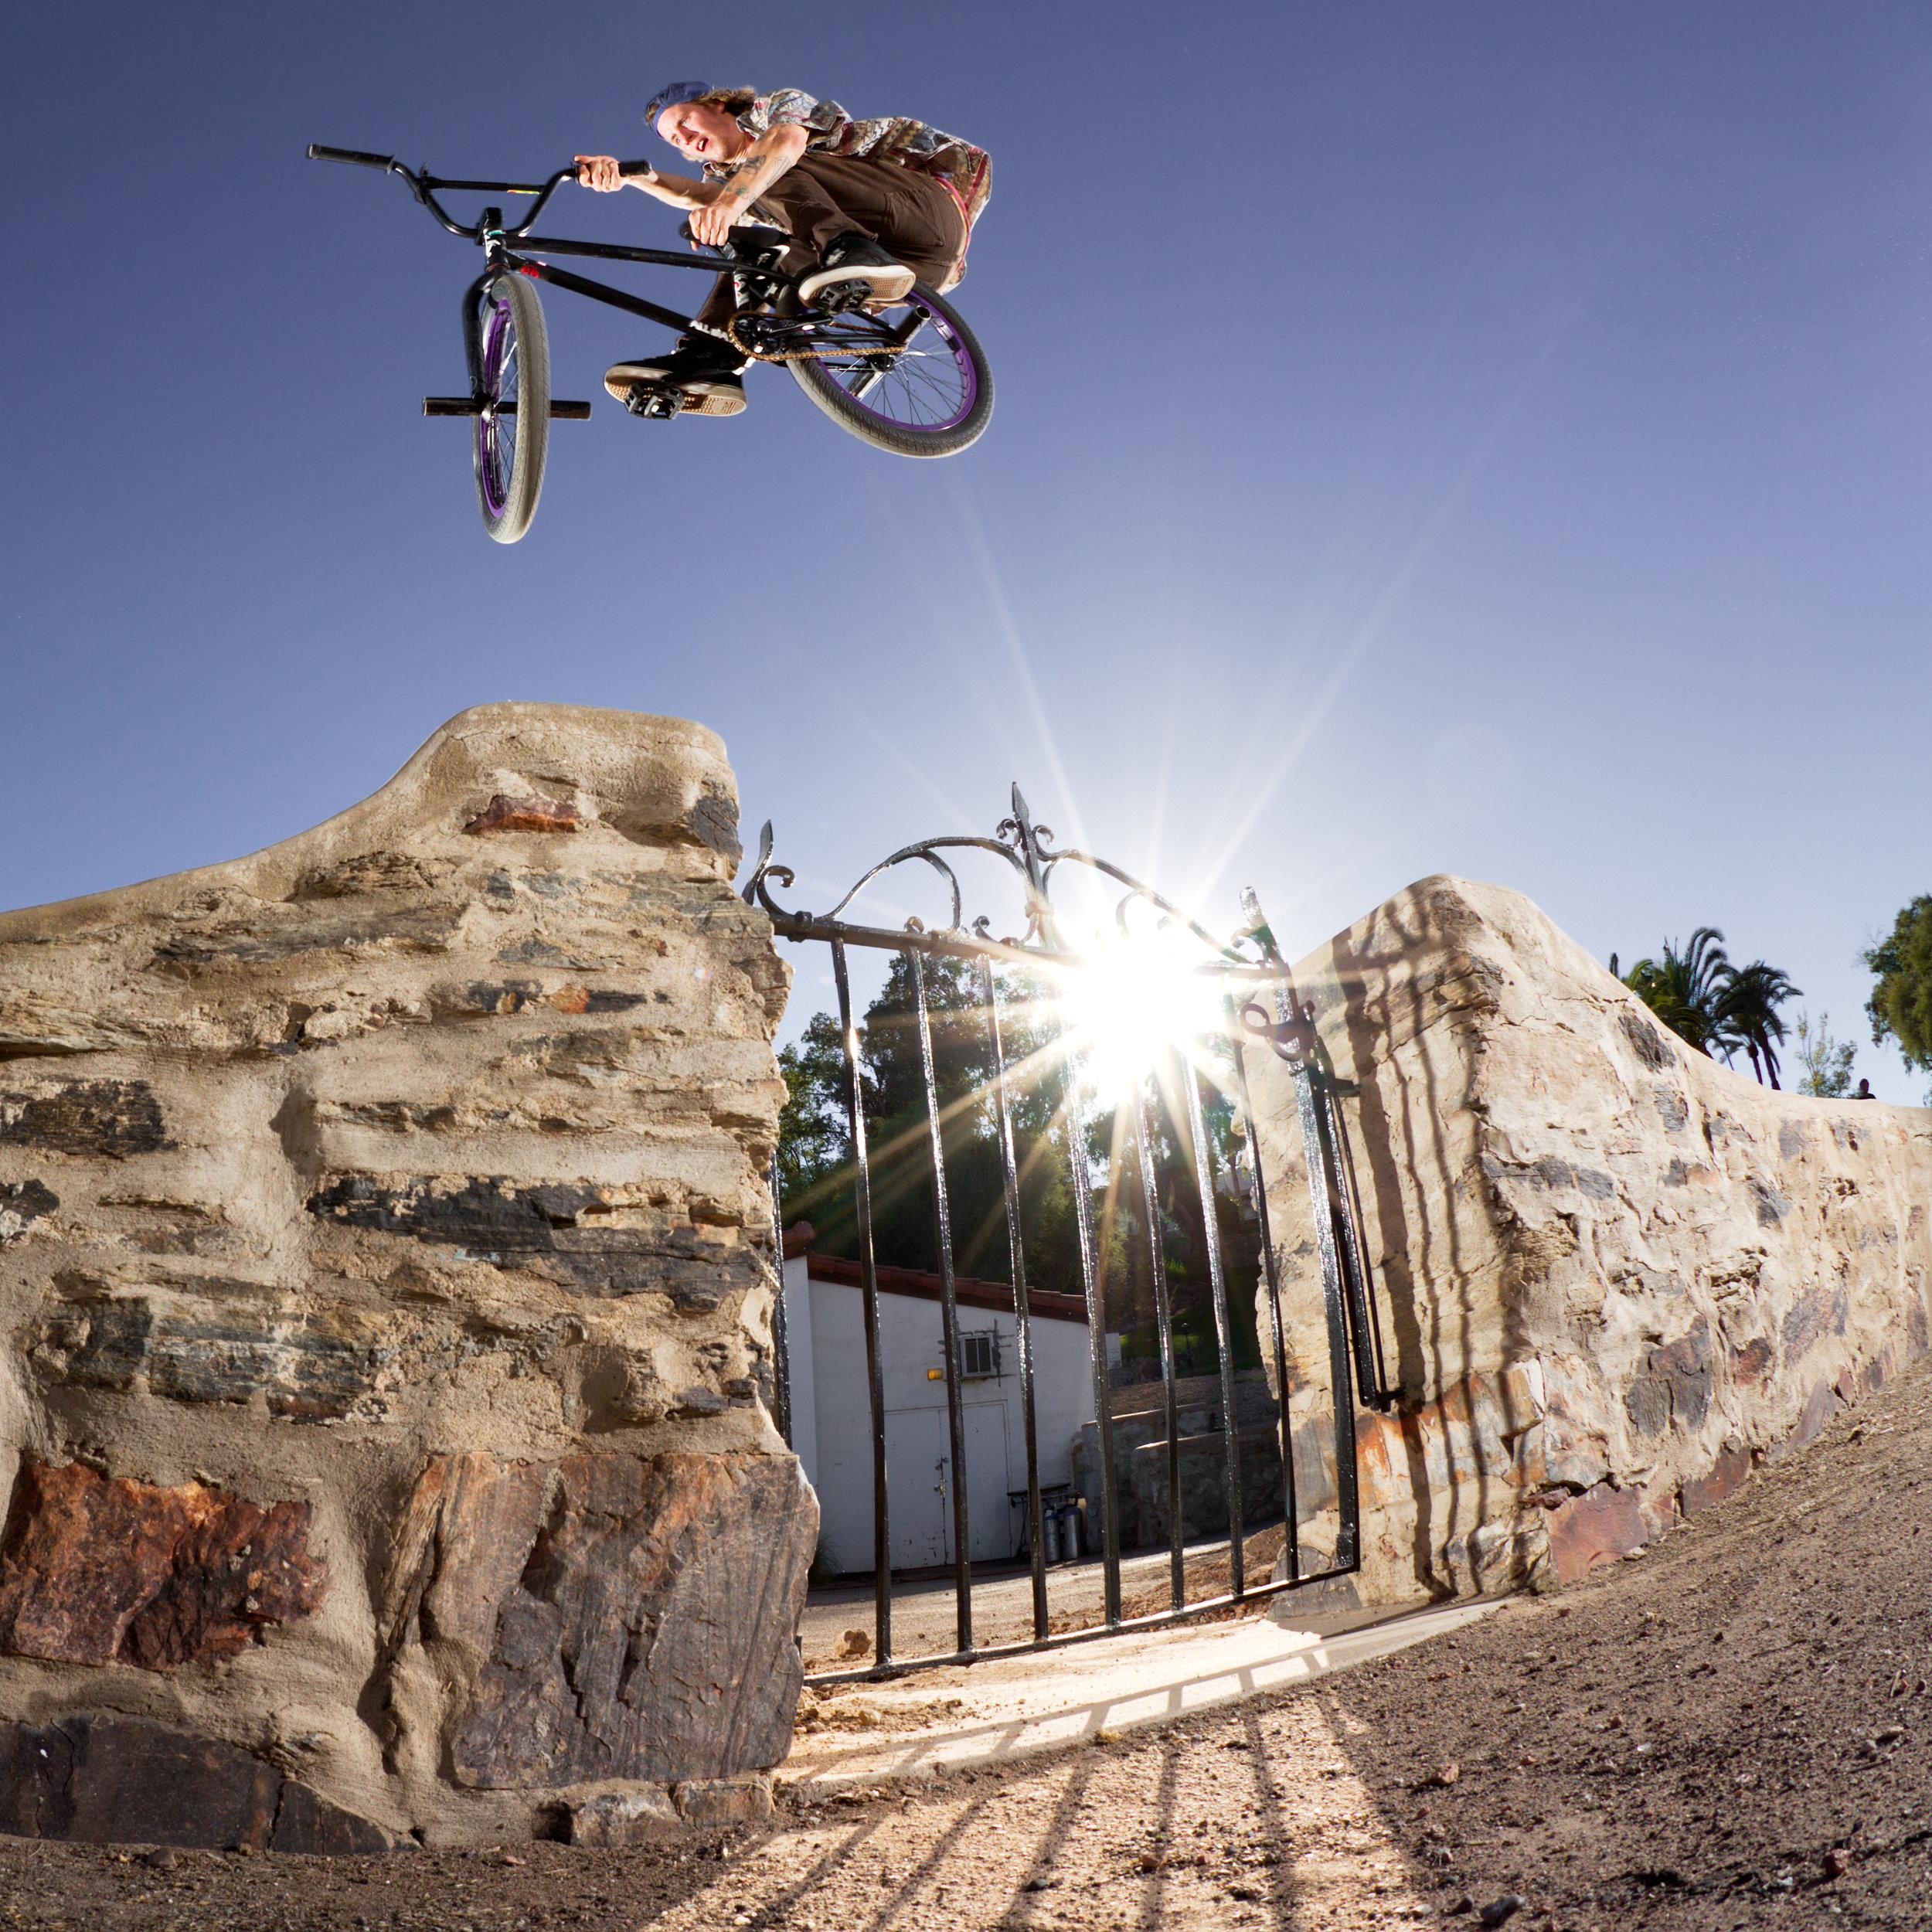 Tony-Malouf-BMX-Toboggan-Arizona-Devin-Feil.jpg